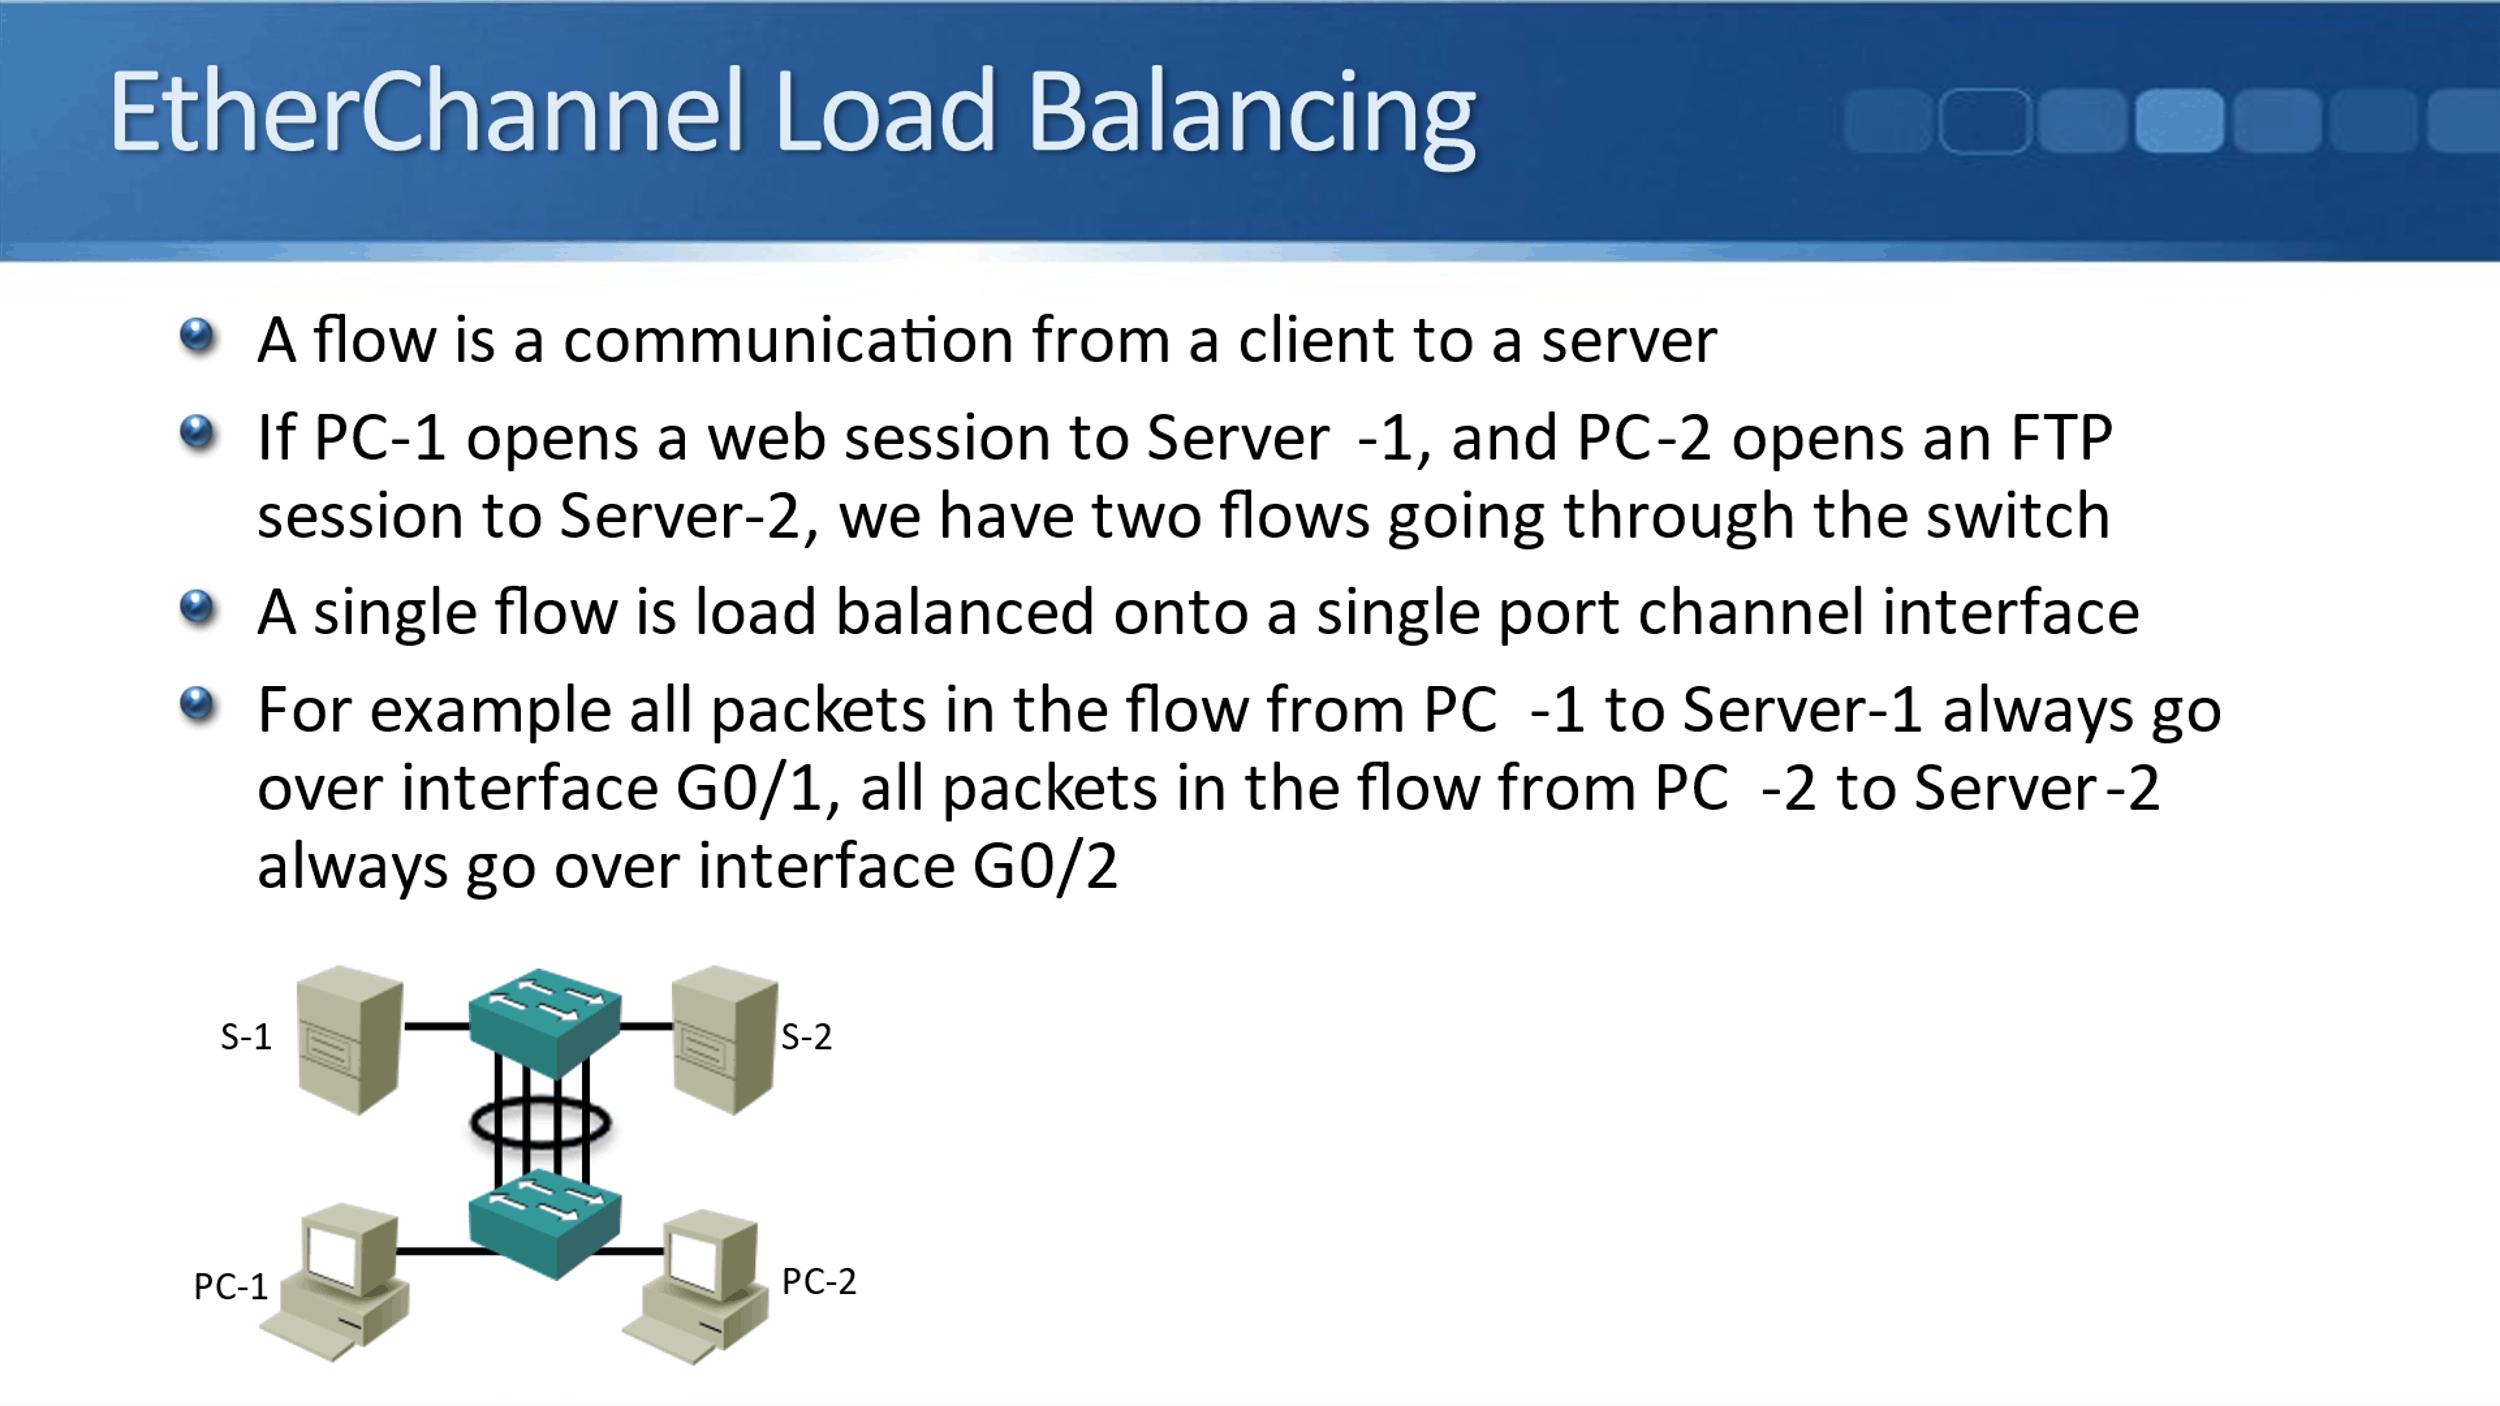 Cisco EtherChannel Load Balancing